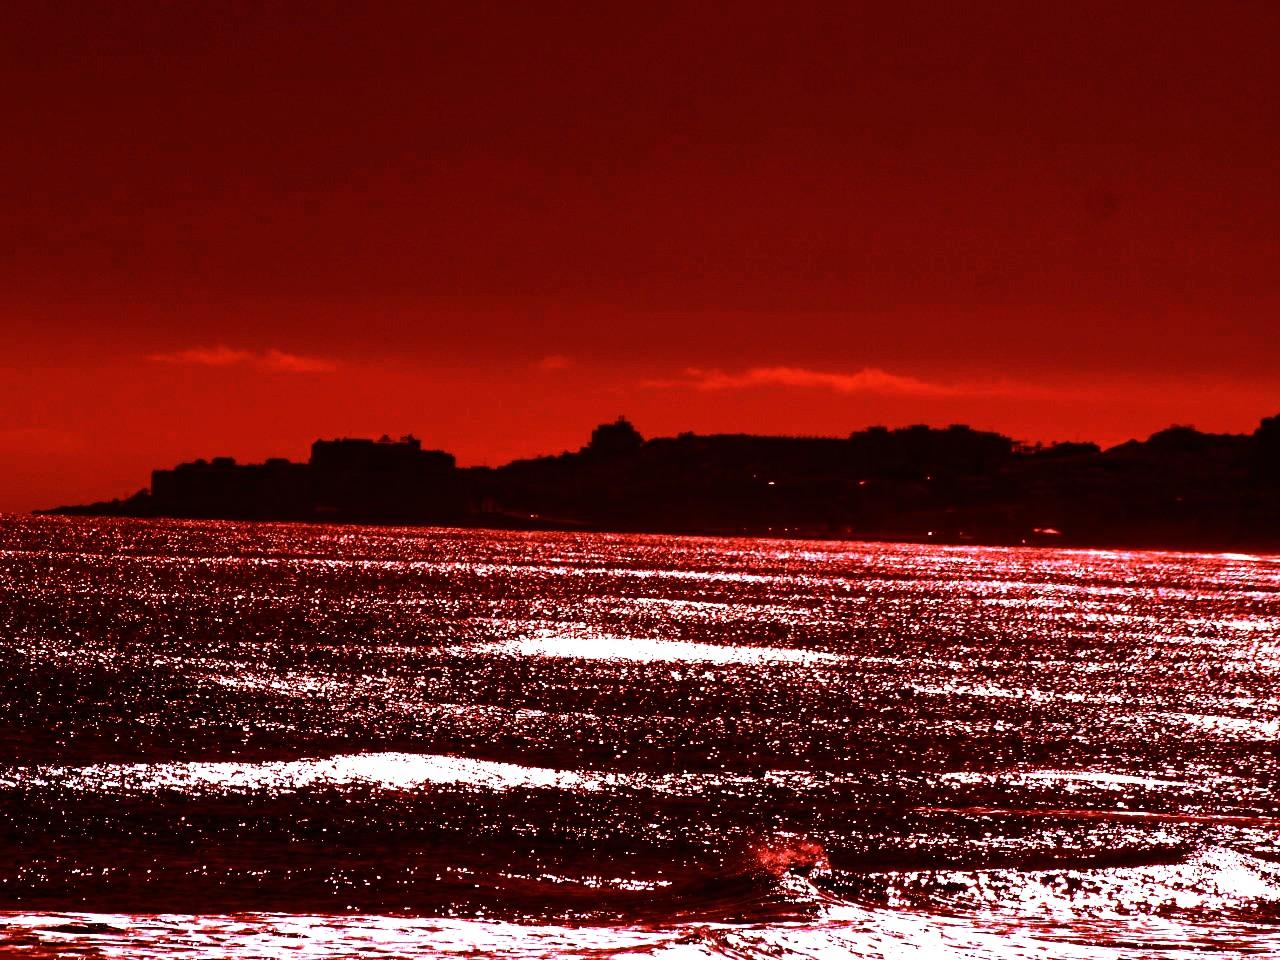 Foto playa La Roqueta. LA MAR DE VINO ,,,,,,,,,,,,,,,, TINTO  ,,,,,,,,,,,,,, Y ,,,,,,,,,,,,,,,ROJO,,,,,,,,,,,,,,,,,,,,,,,,,,,